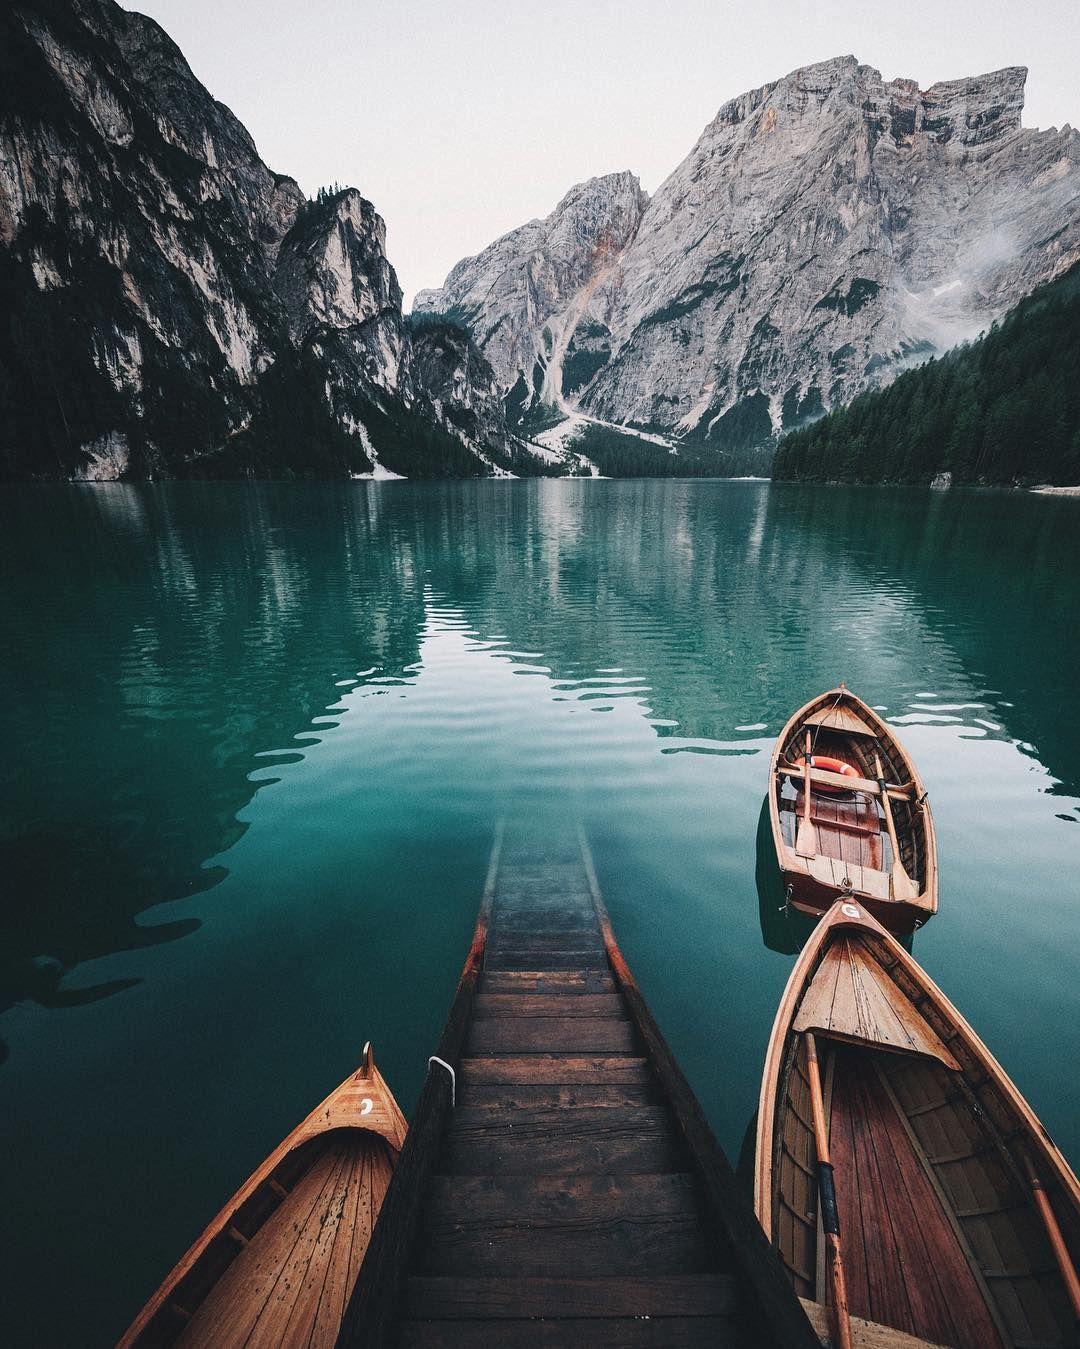 Amazing Beautiful Mountain Landscape Photography By Marco Bäni #inspiration  #photography